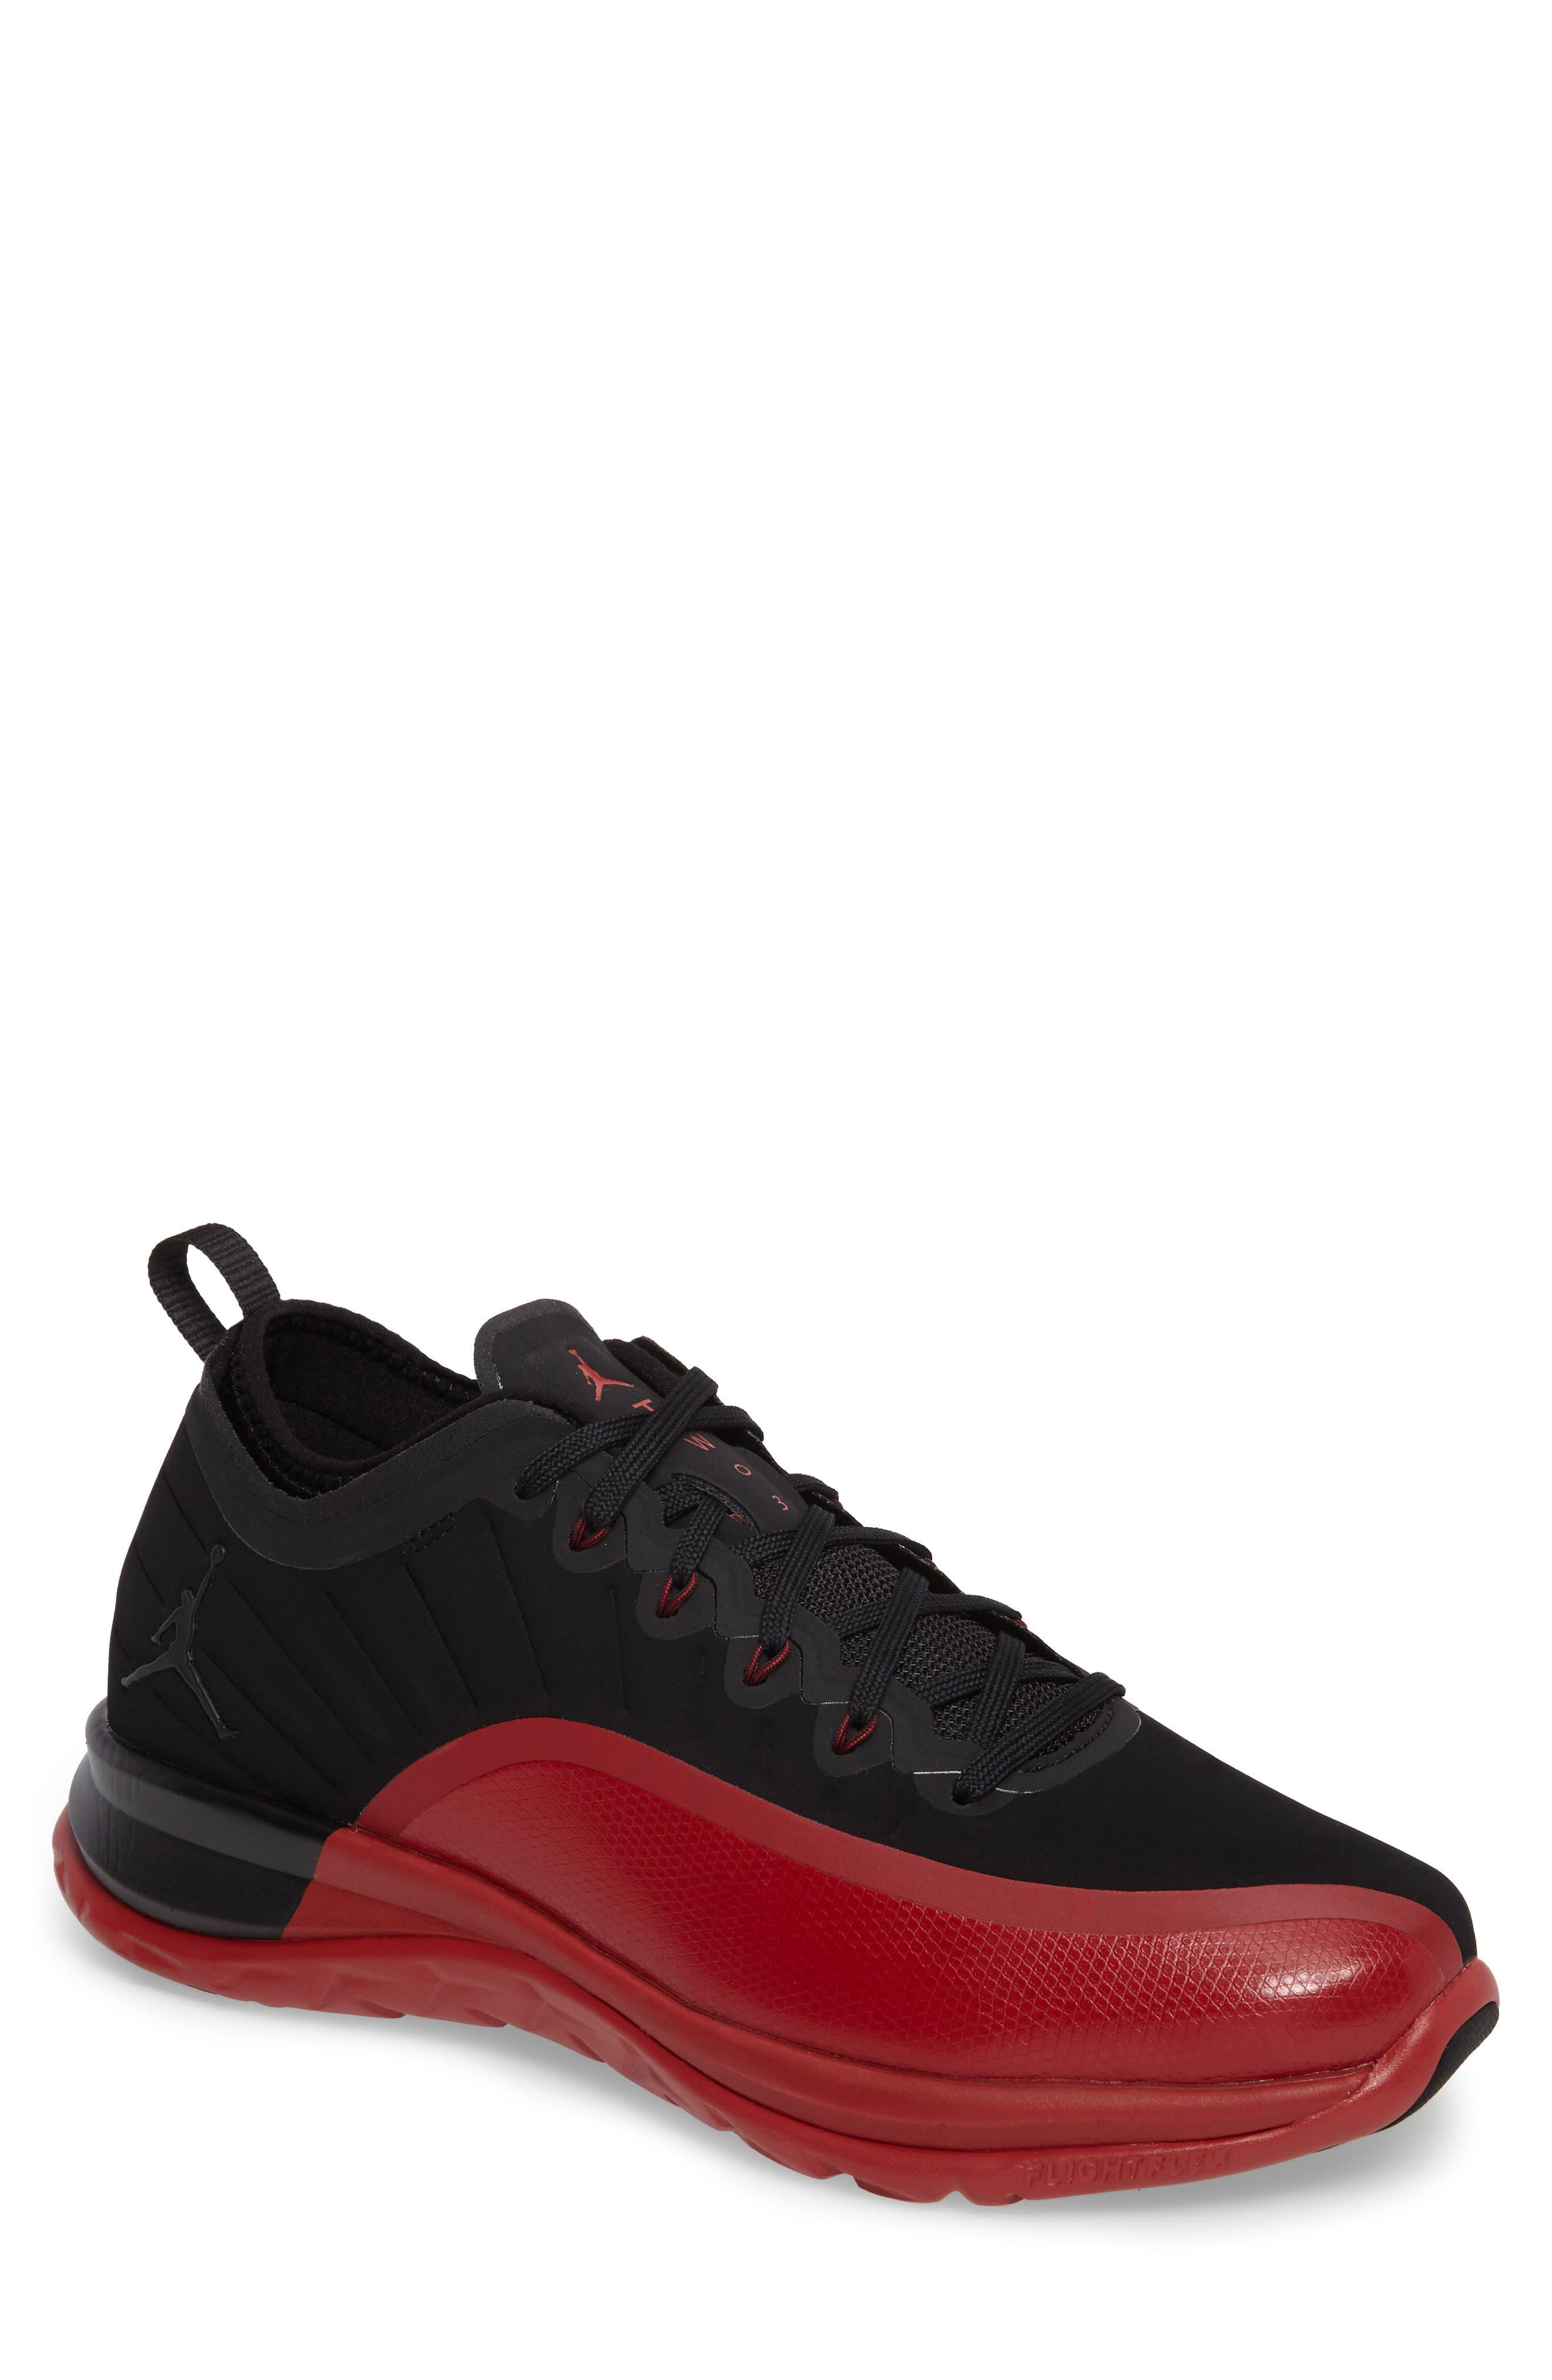 Jordan Trainer Prime Sneaker,                             Main thumbnail 1, color,                             Black/ Black/ Gym Red